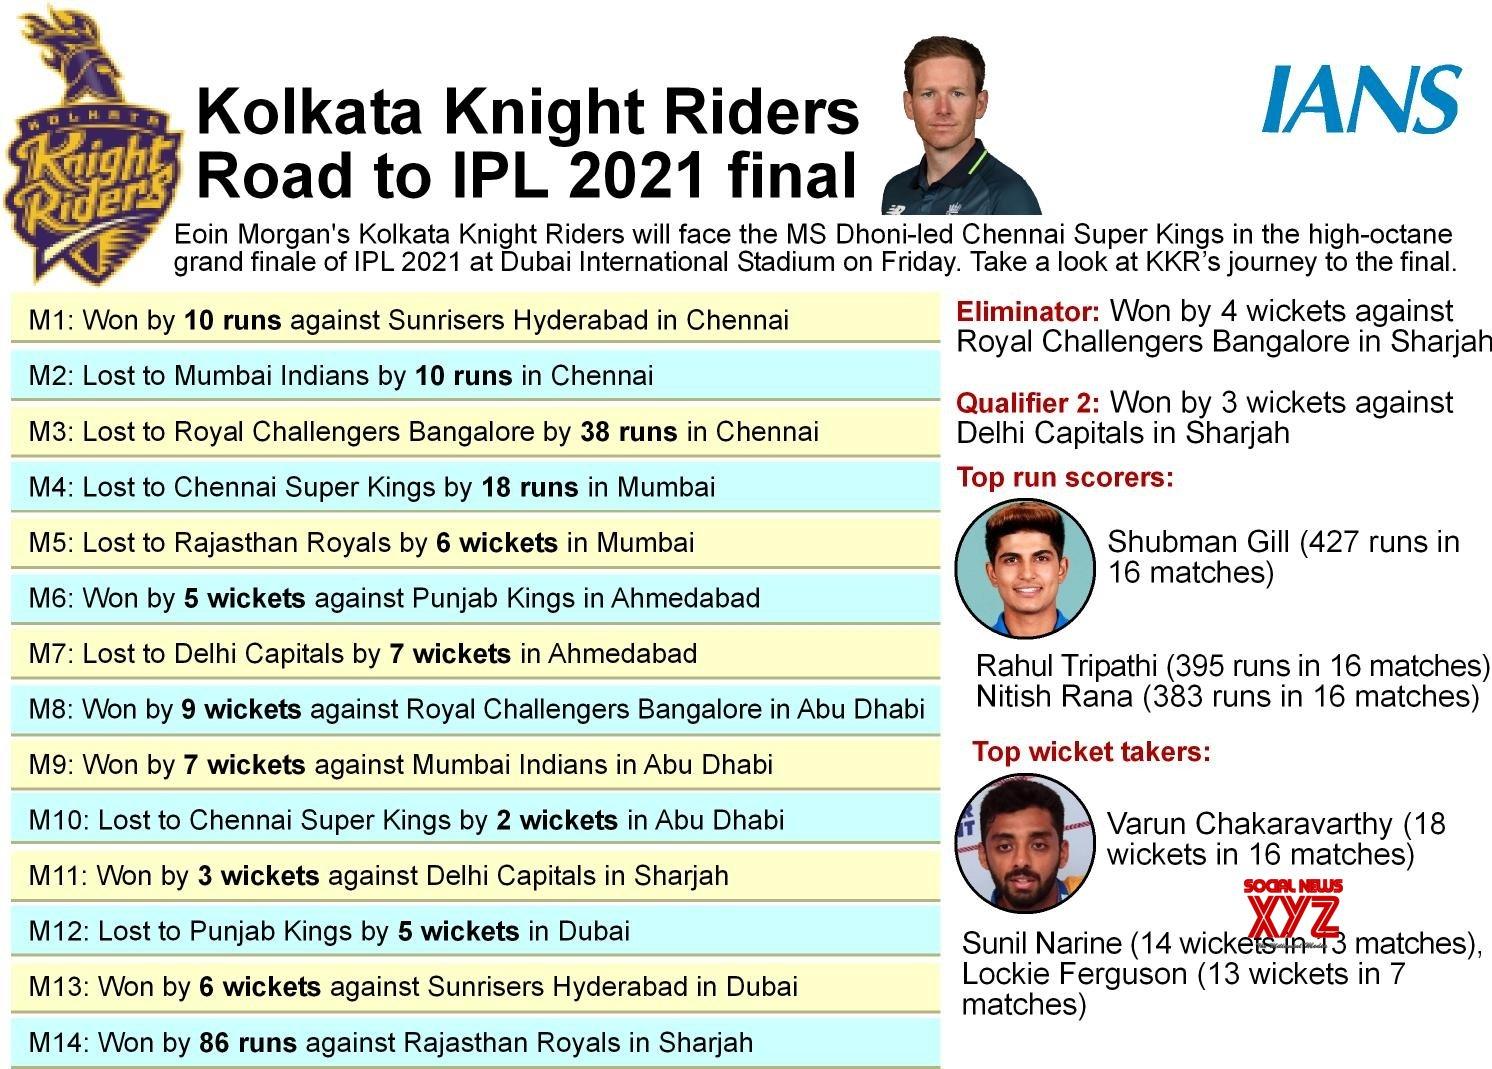 Infographics: - kolkata knight riders road to IPL 2021 final #Gallery